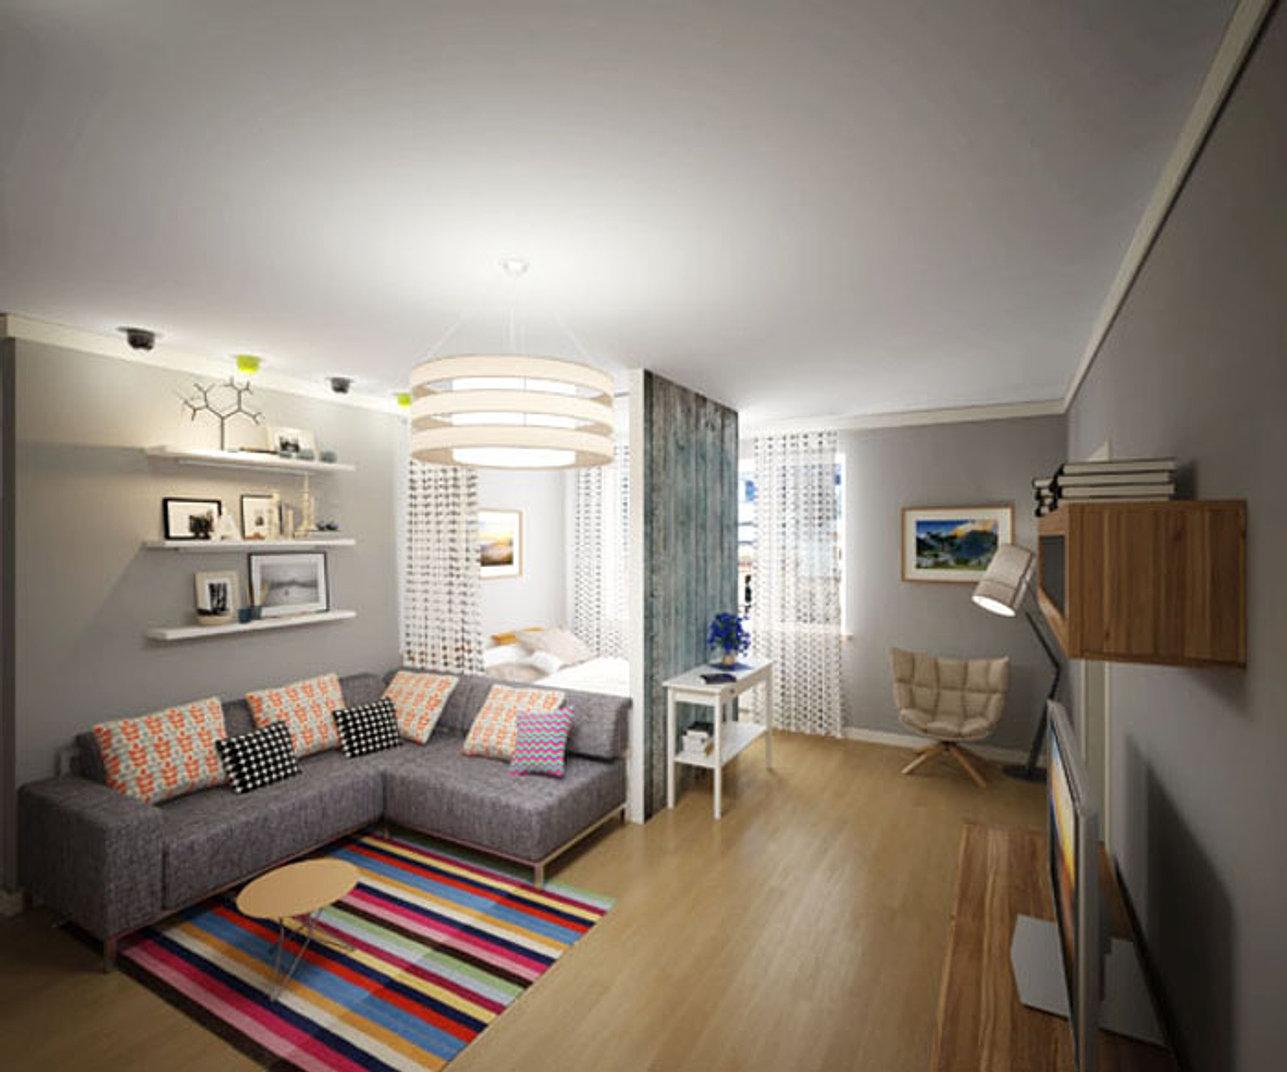 Дизайн 3х комнатной квартиры брежневки в Санкт-Петербурге